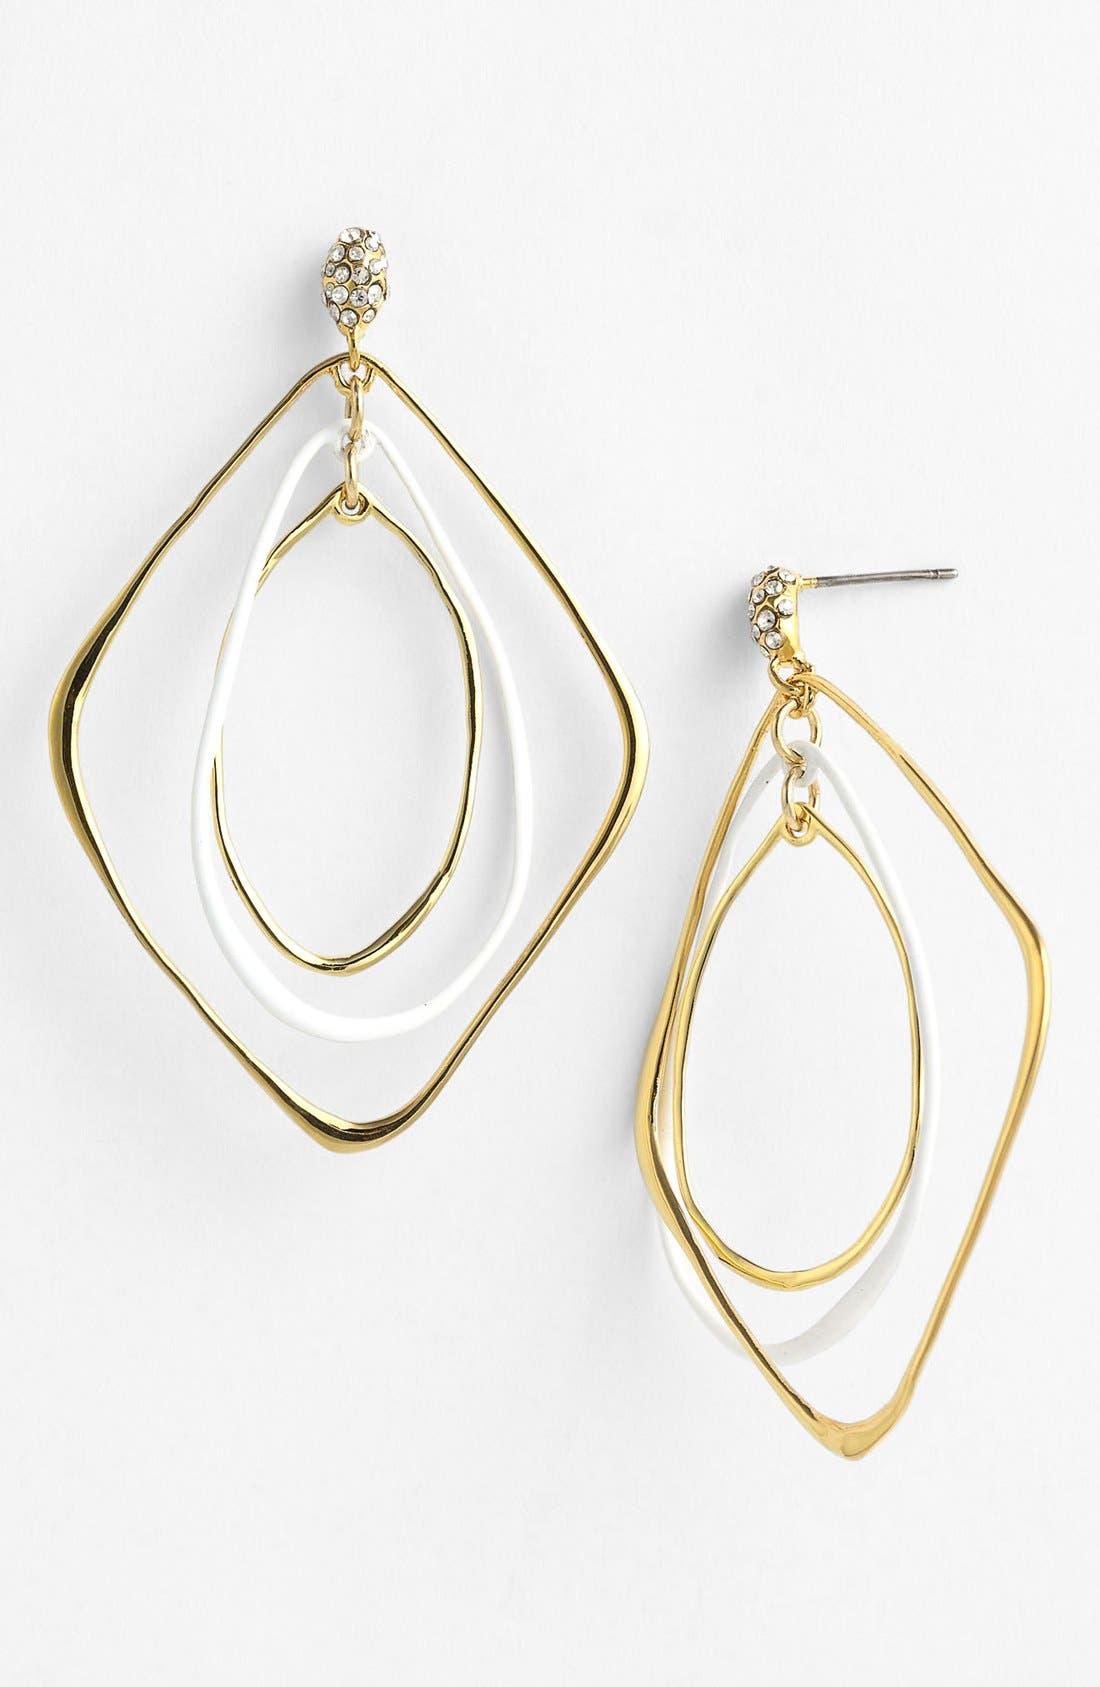 Alternate Image 1 Selected - Alexis Bittar 'Miss Havisham - Liquid Gold' Orbiting Drop Earrings